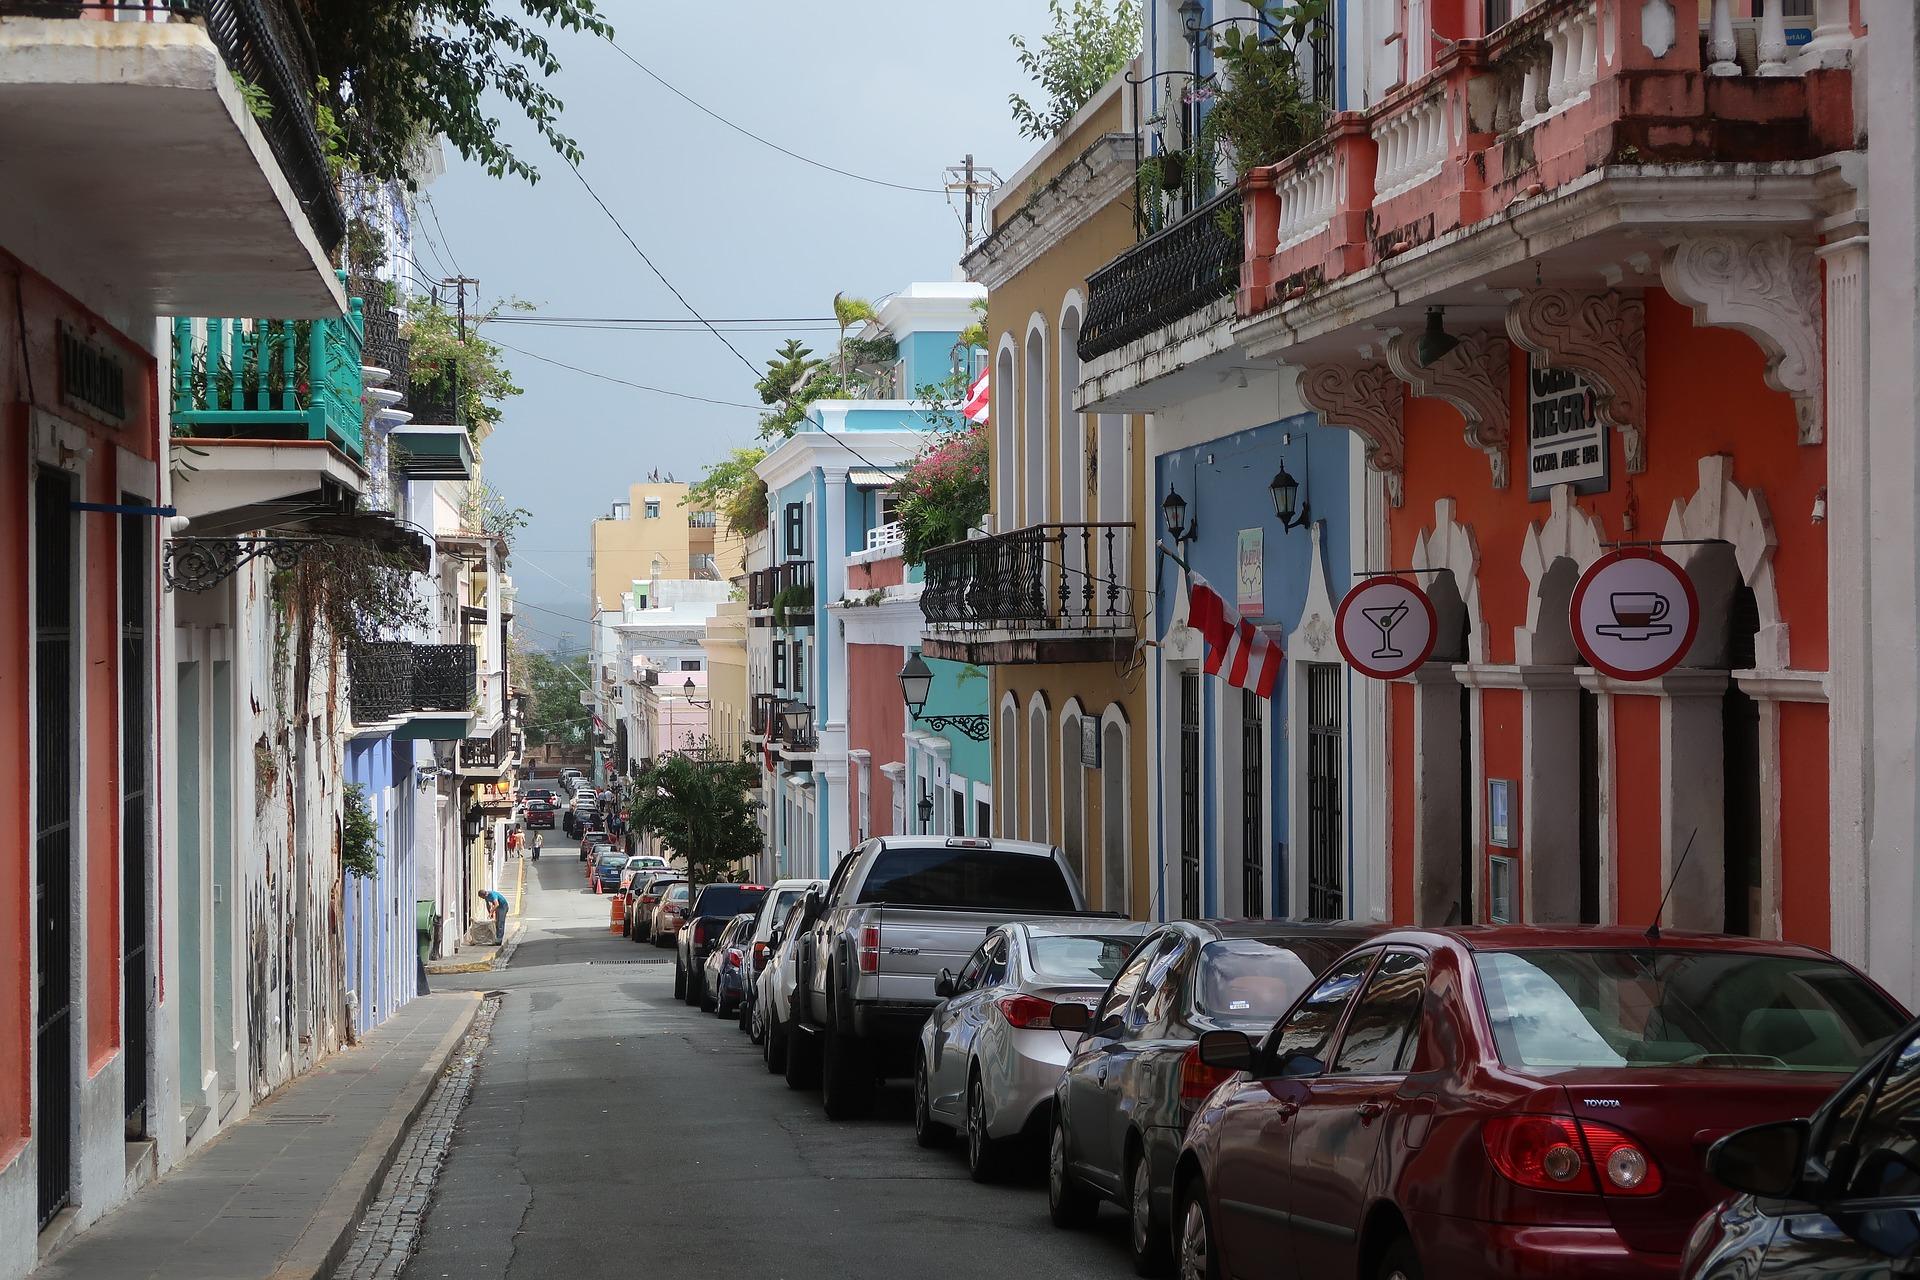 puerto-rico-3390864_1920.jpg